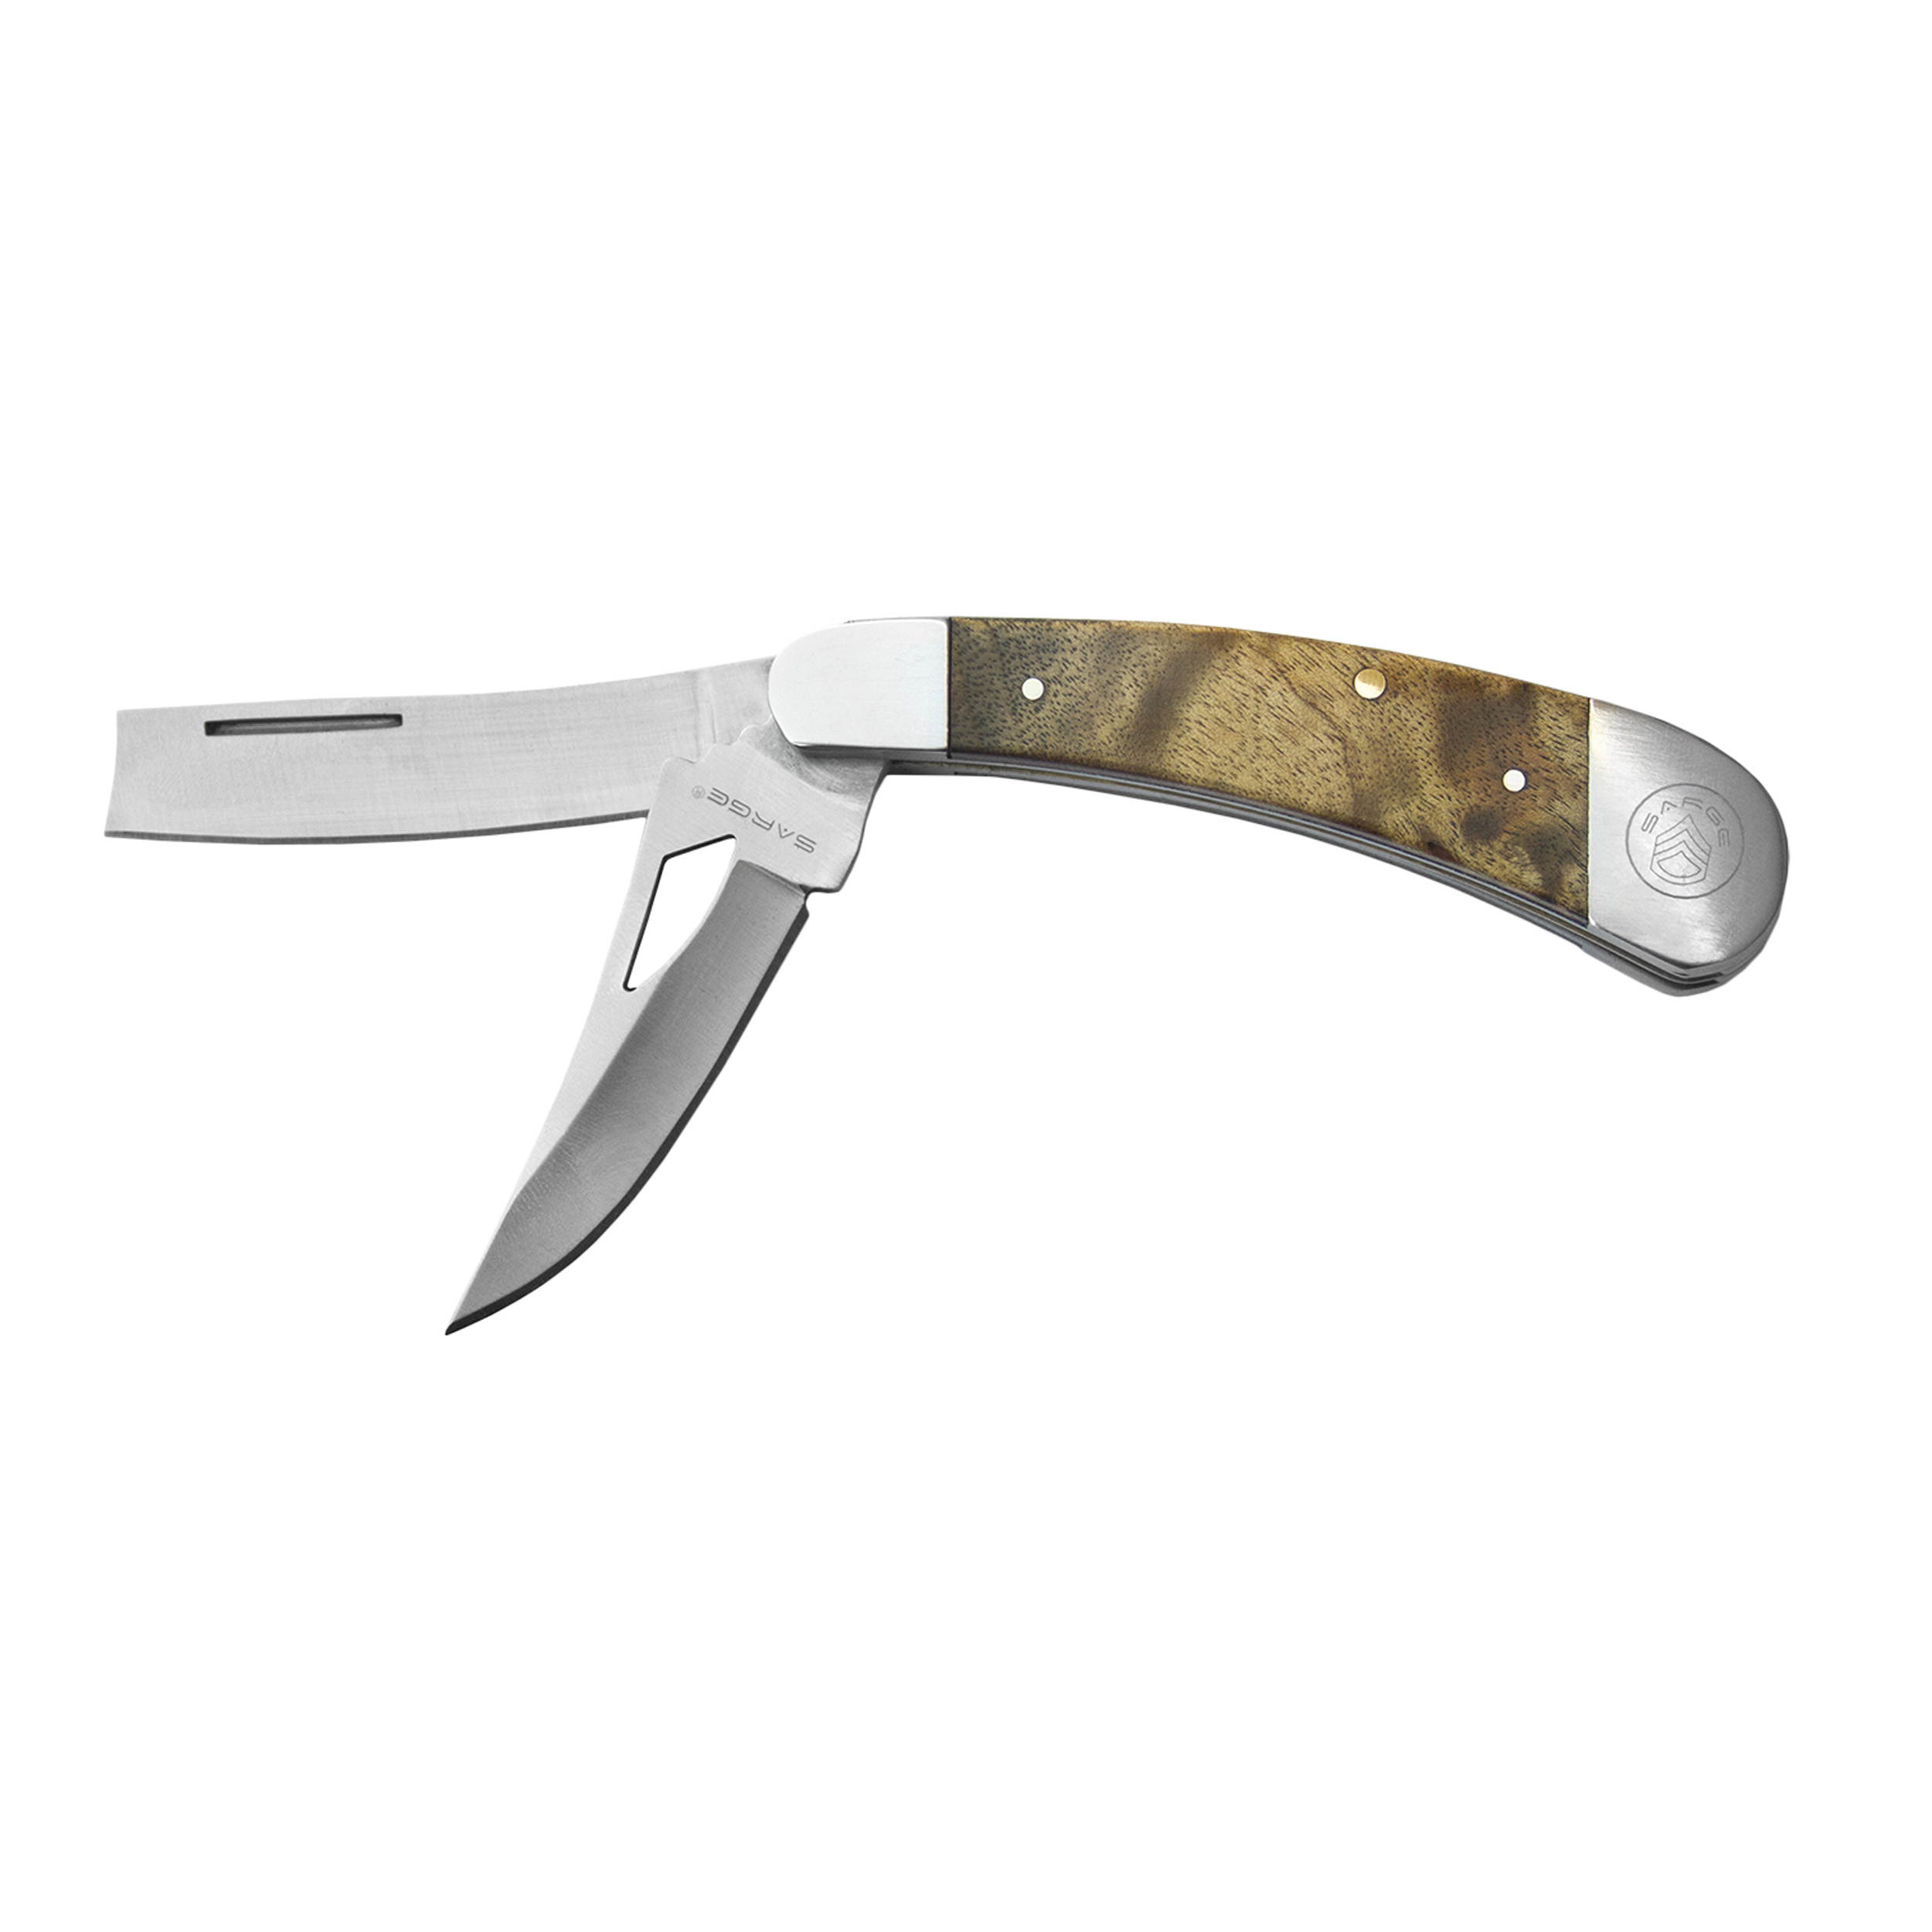 Razor XL - 2 Blade Razor Pocket Knife, Stainles Steel 2